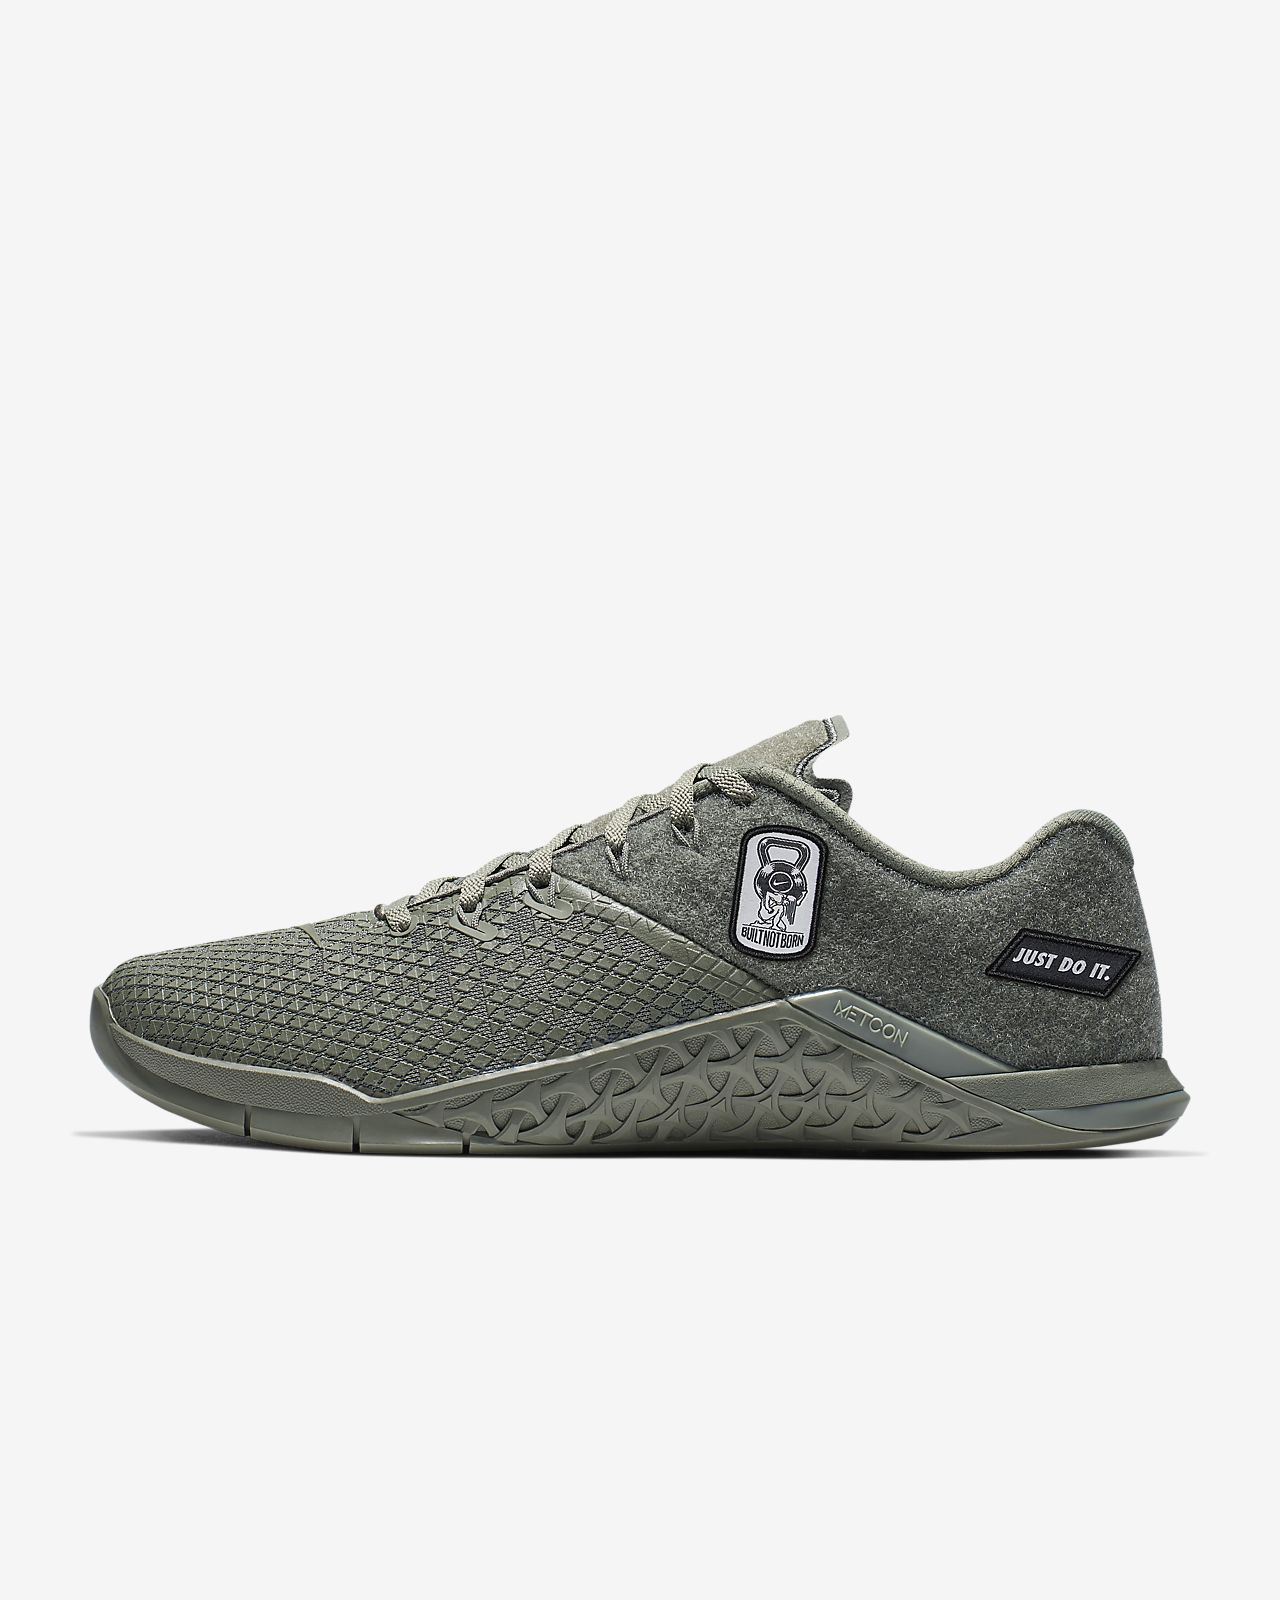 Мужские кроссовки для тренинга Nike Metcon 4 XD Patch